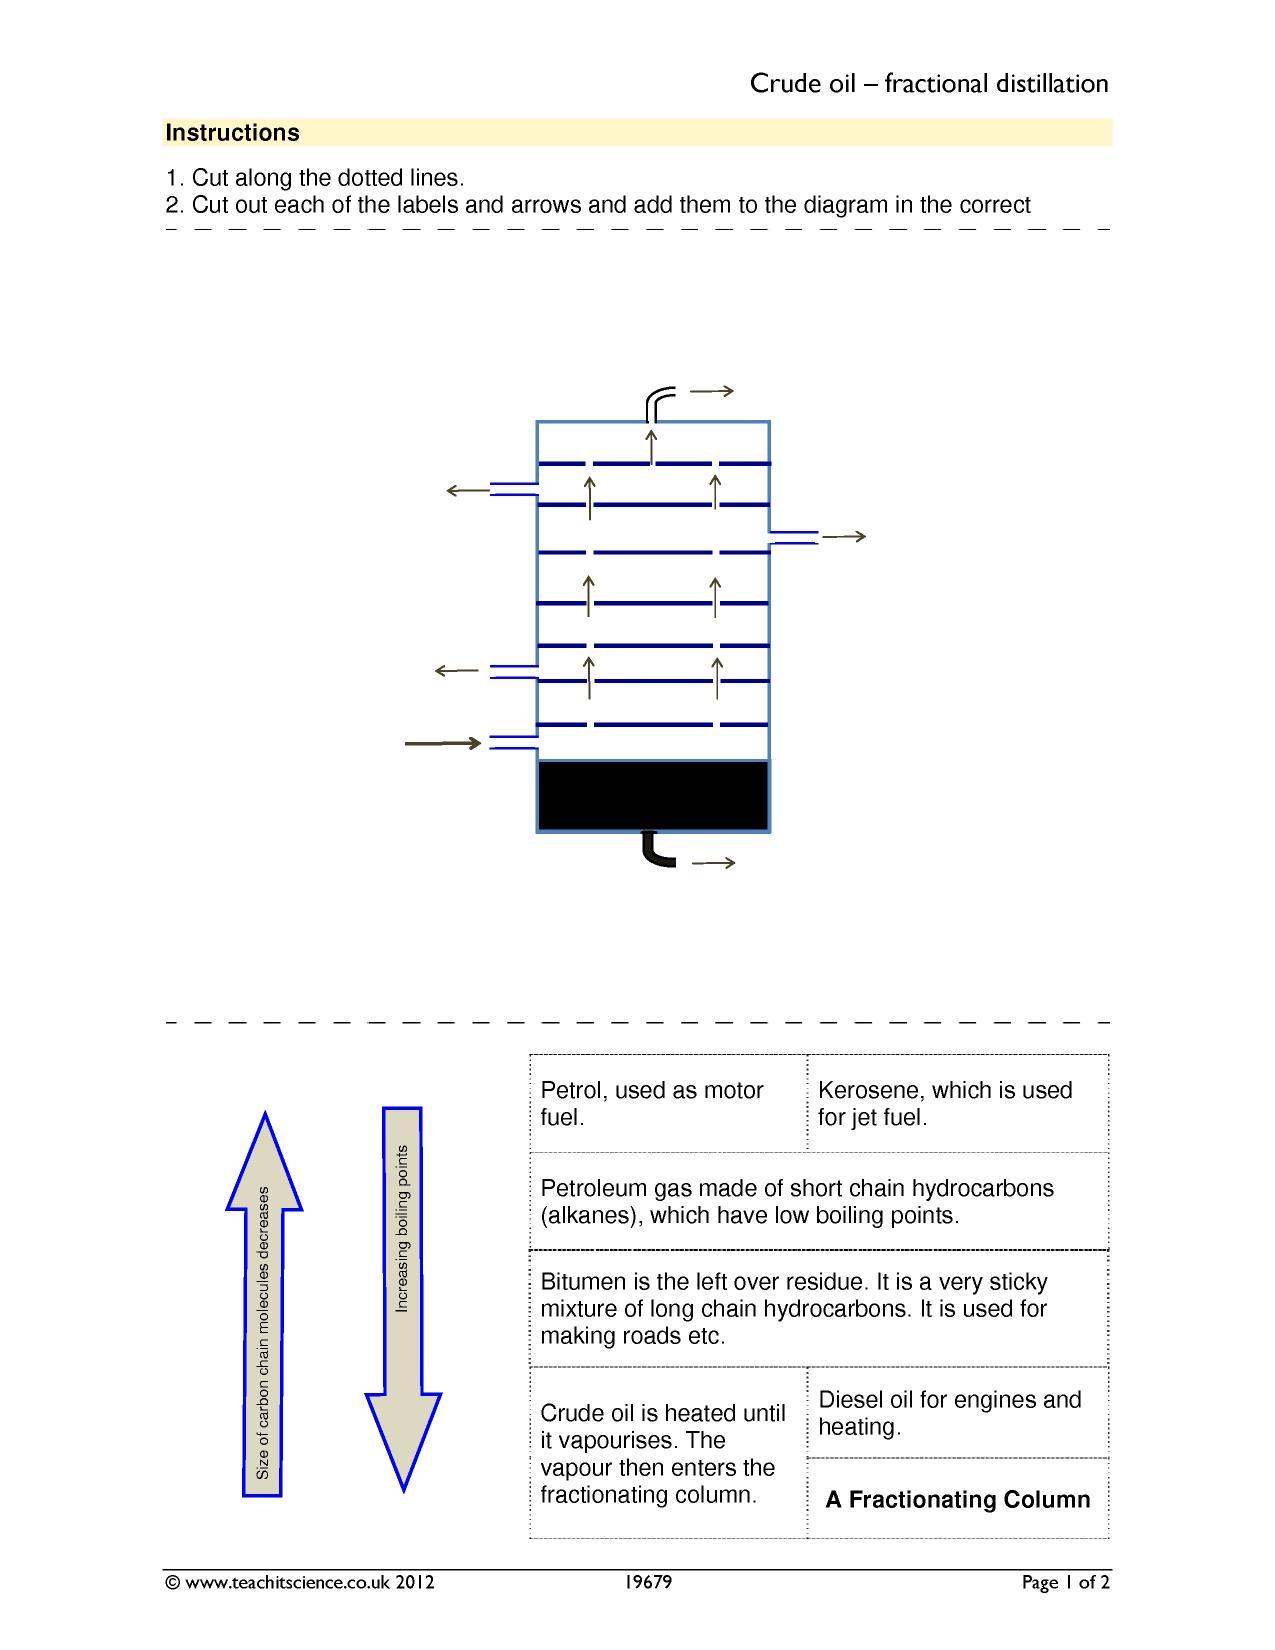 Crude oil fractional distillation Organic chemistry incl fuels – Fractional Distillation of Crude Oil Worksheet